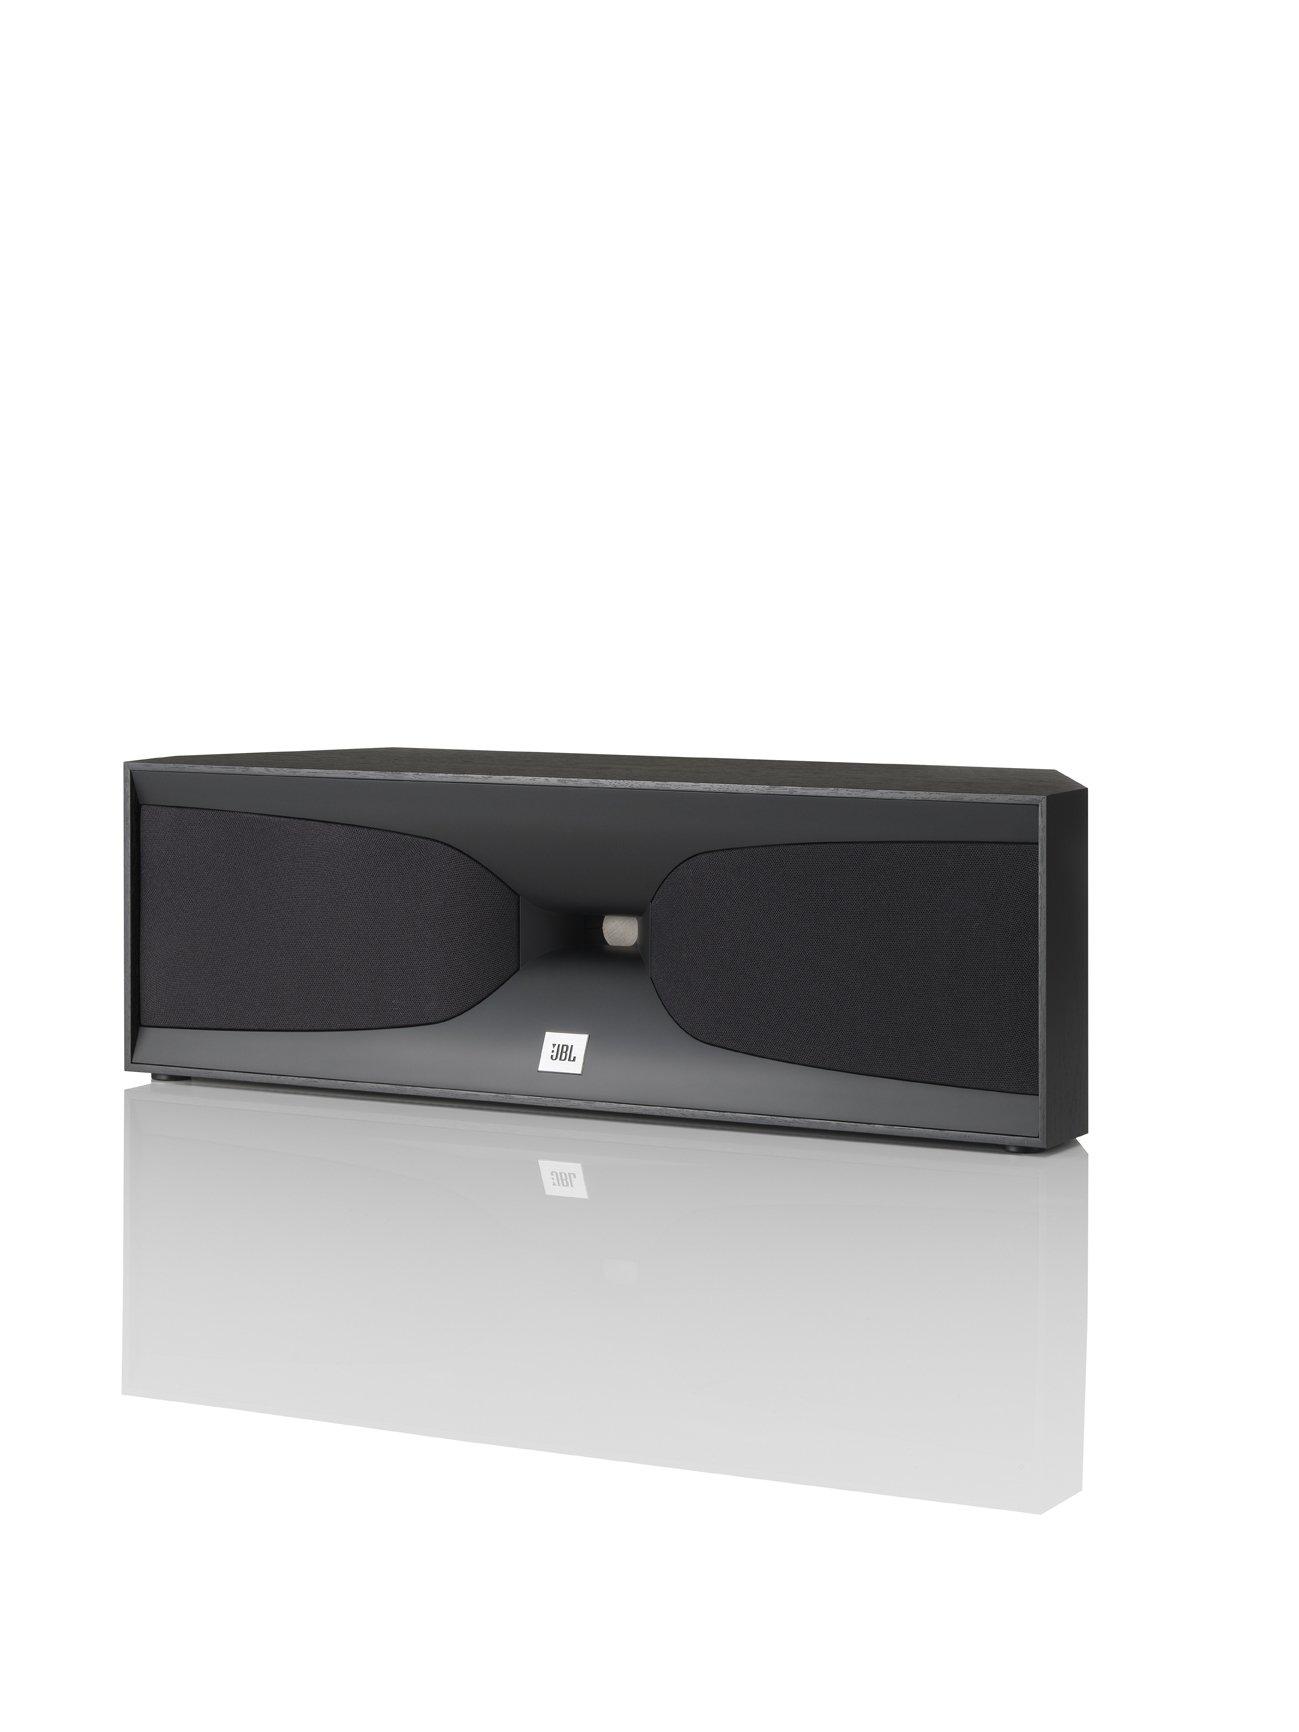 JBL Studio 520CBK 2-Way Dual 4-Inch Center Channel Speaker